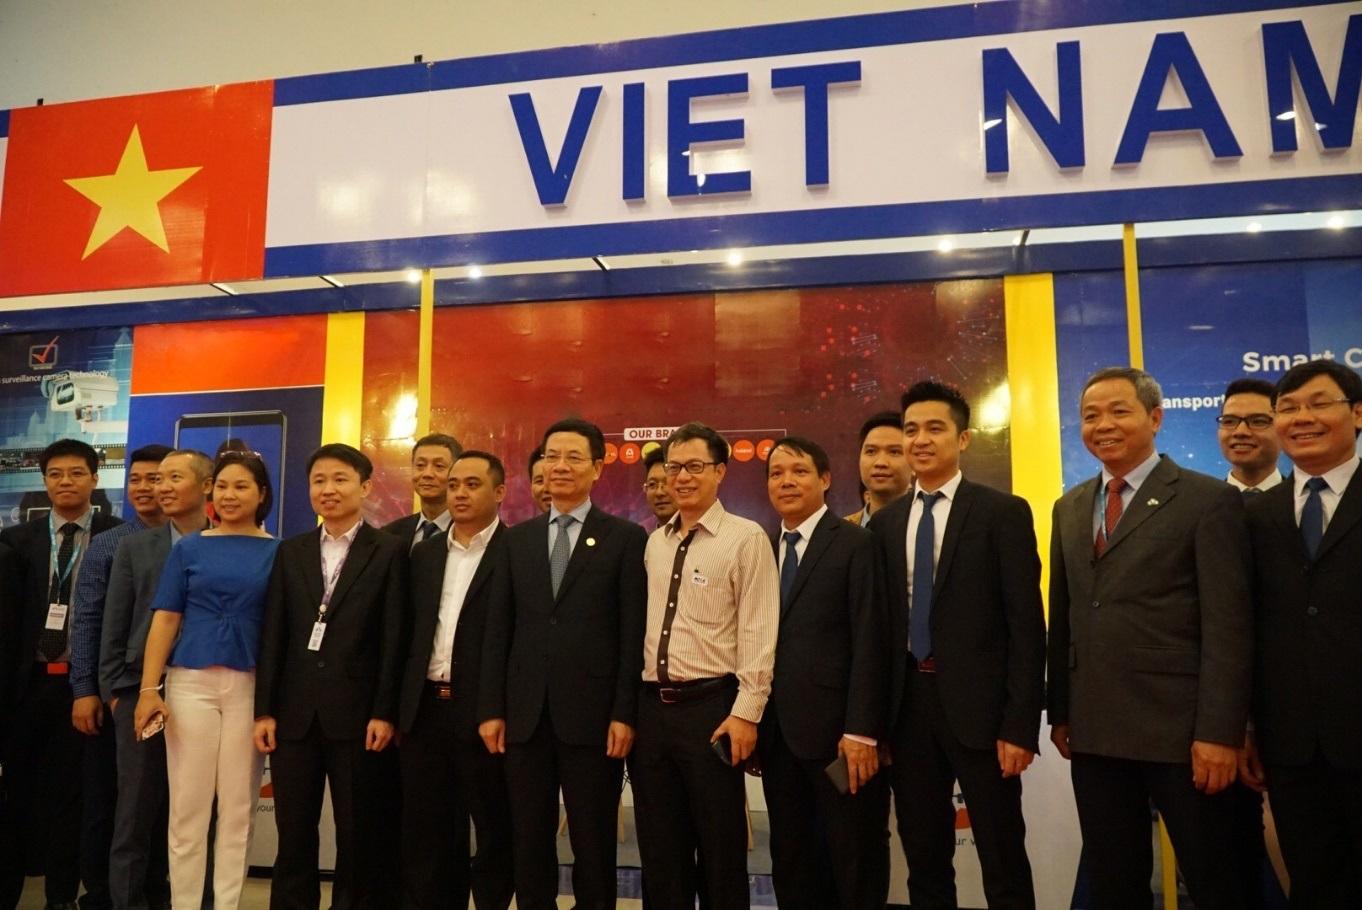 Digital Cambodia 2019: MobiFone giới thiệu các giải pháp 4.0 cho doanh nghiệp ASEAN